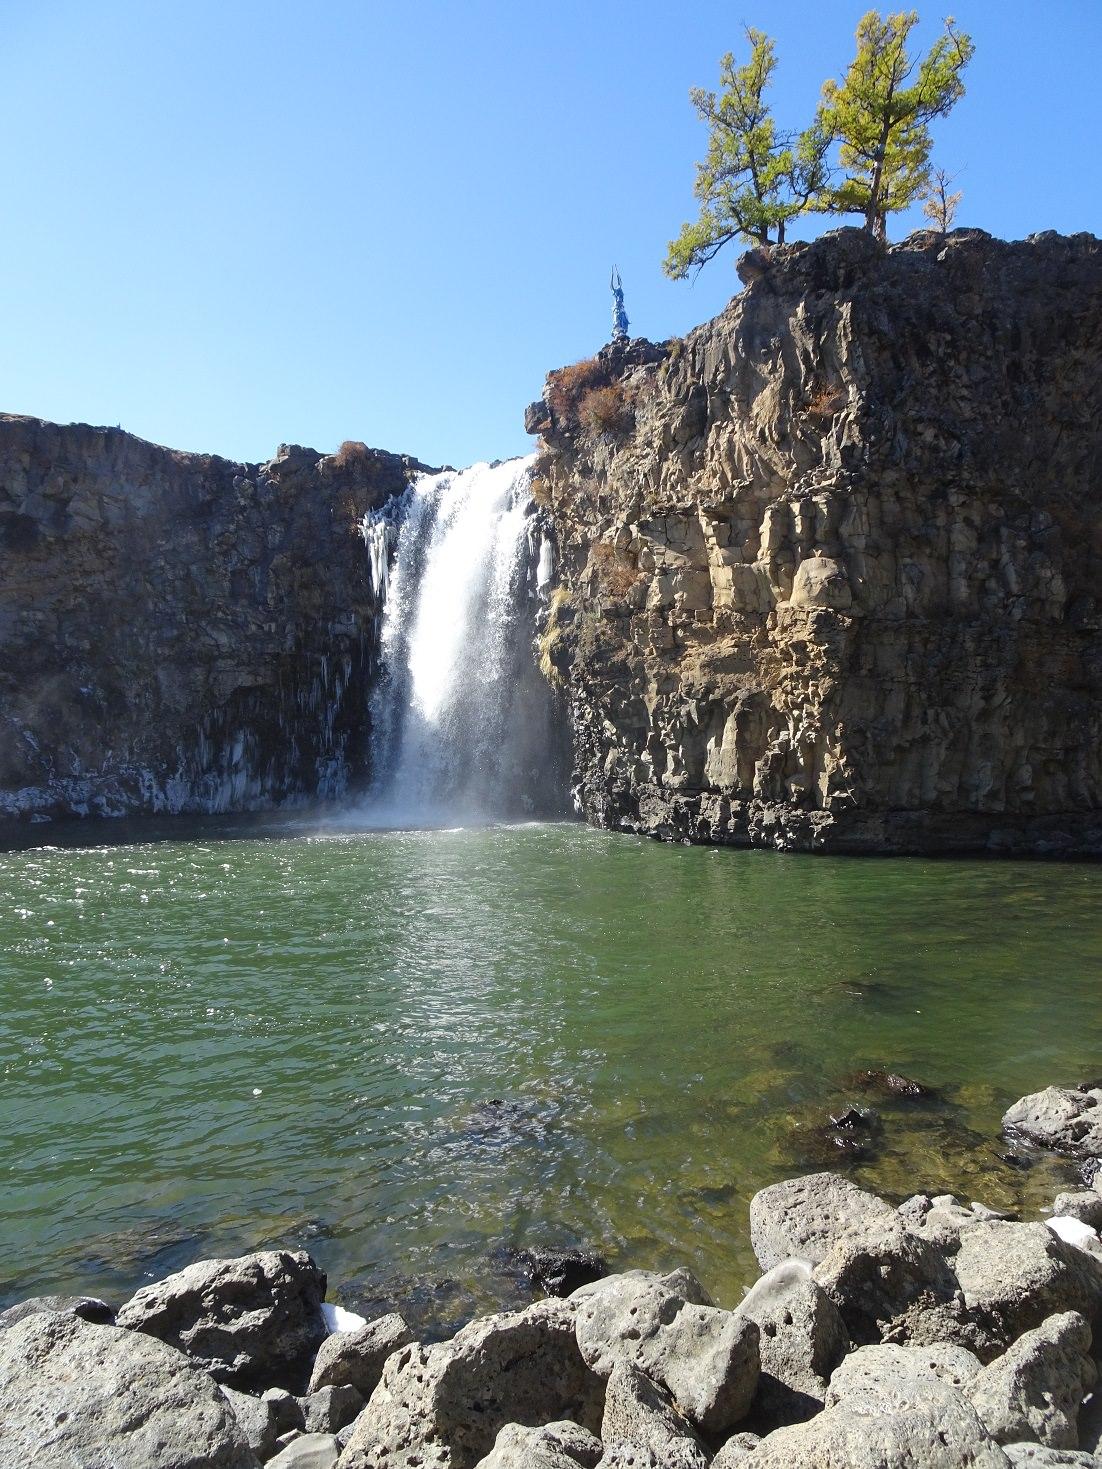 orkhon falls in mongolia